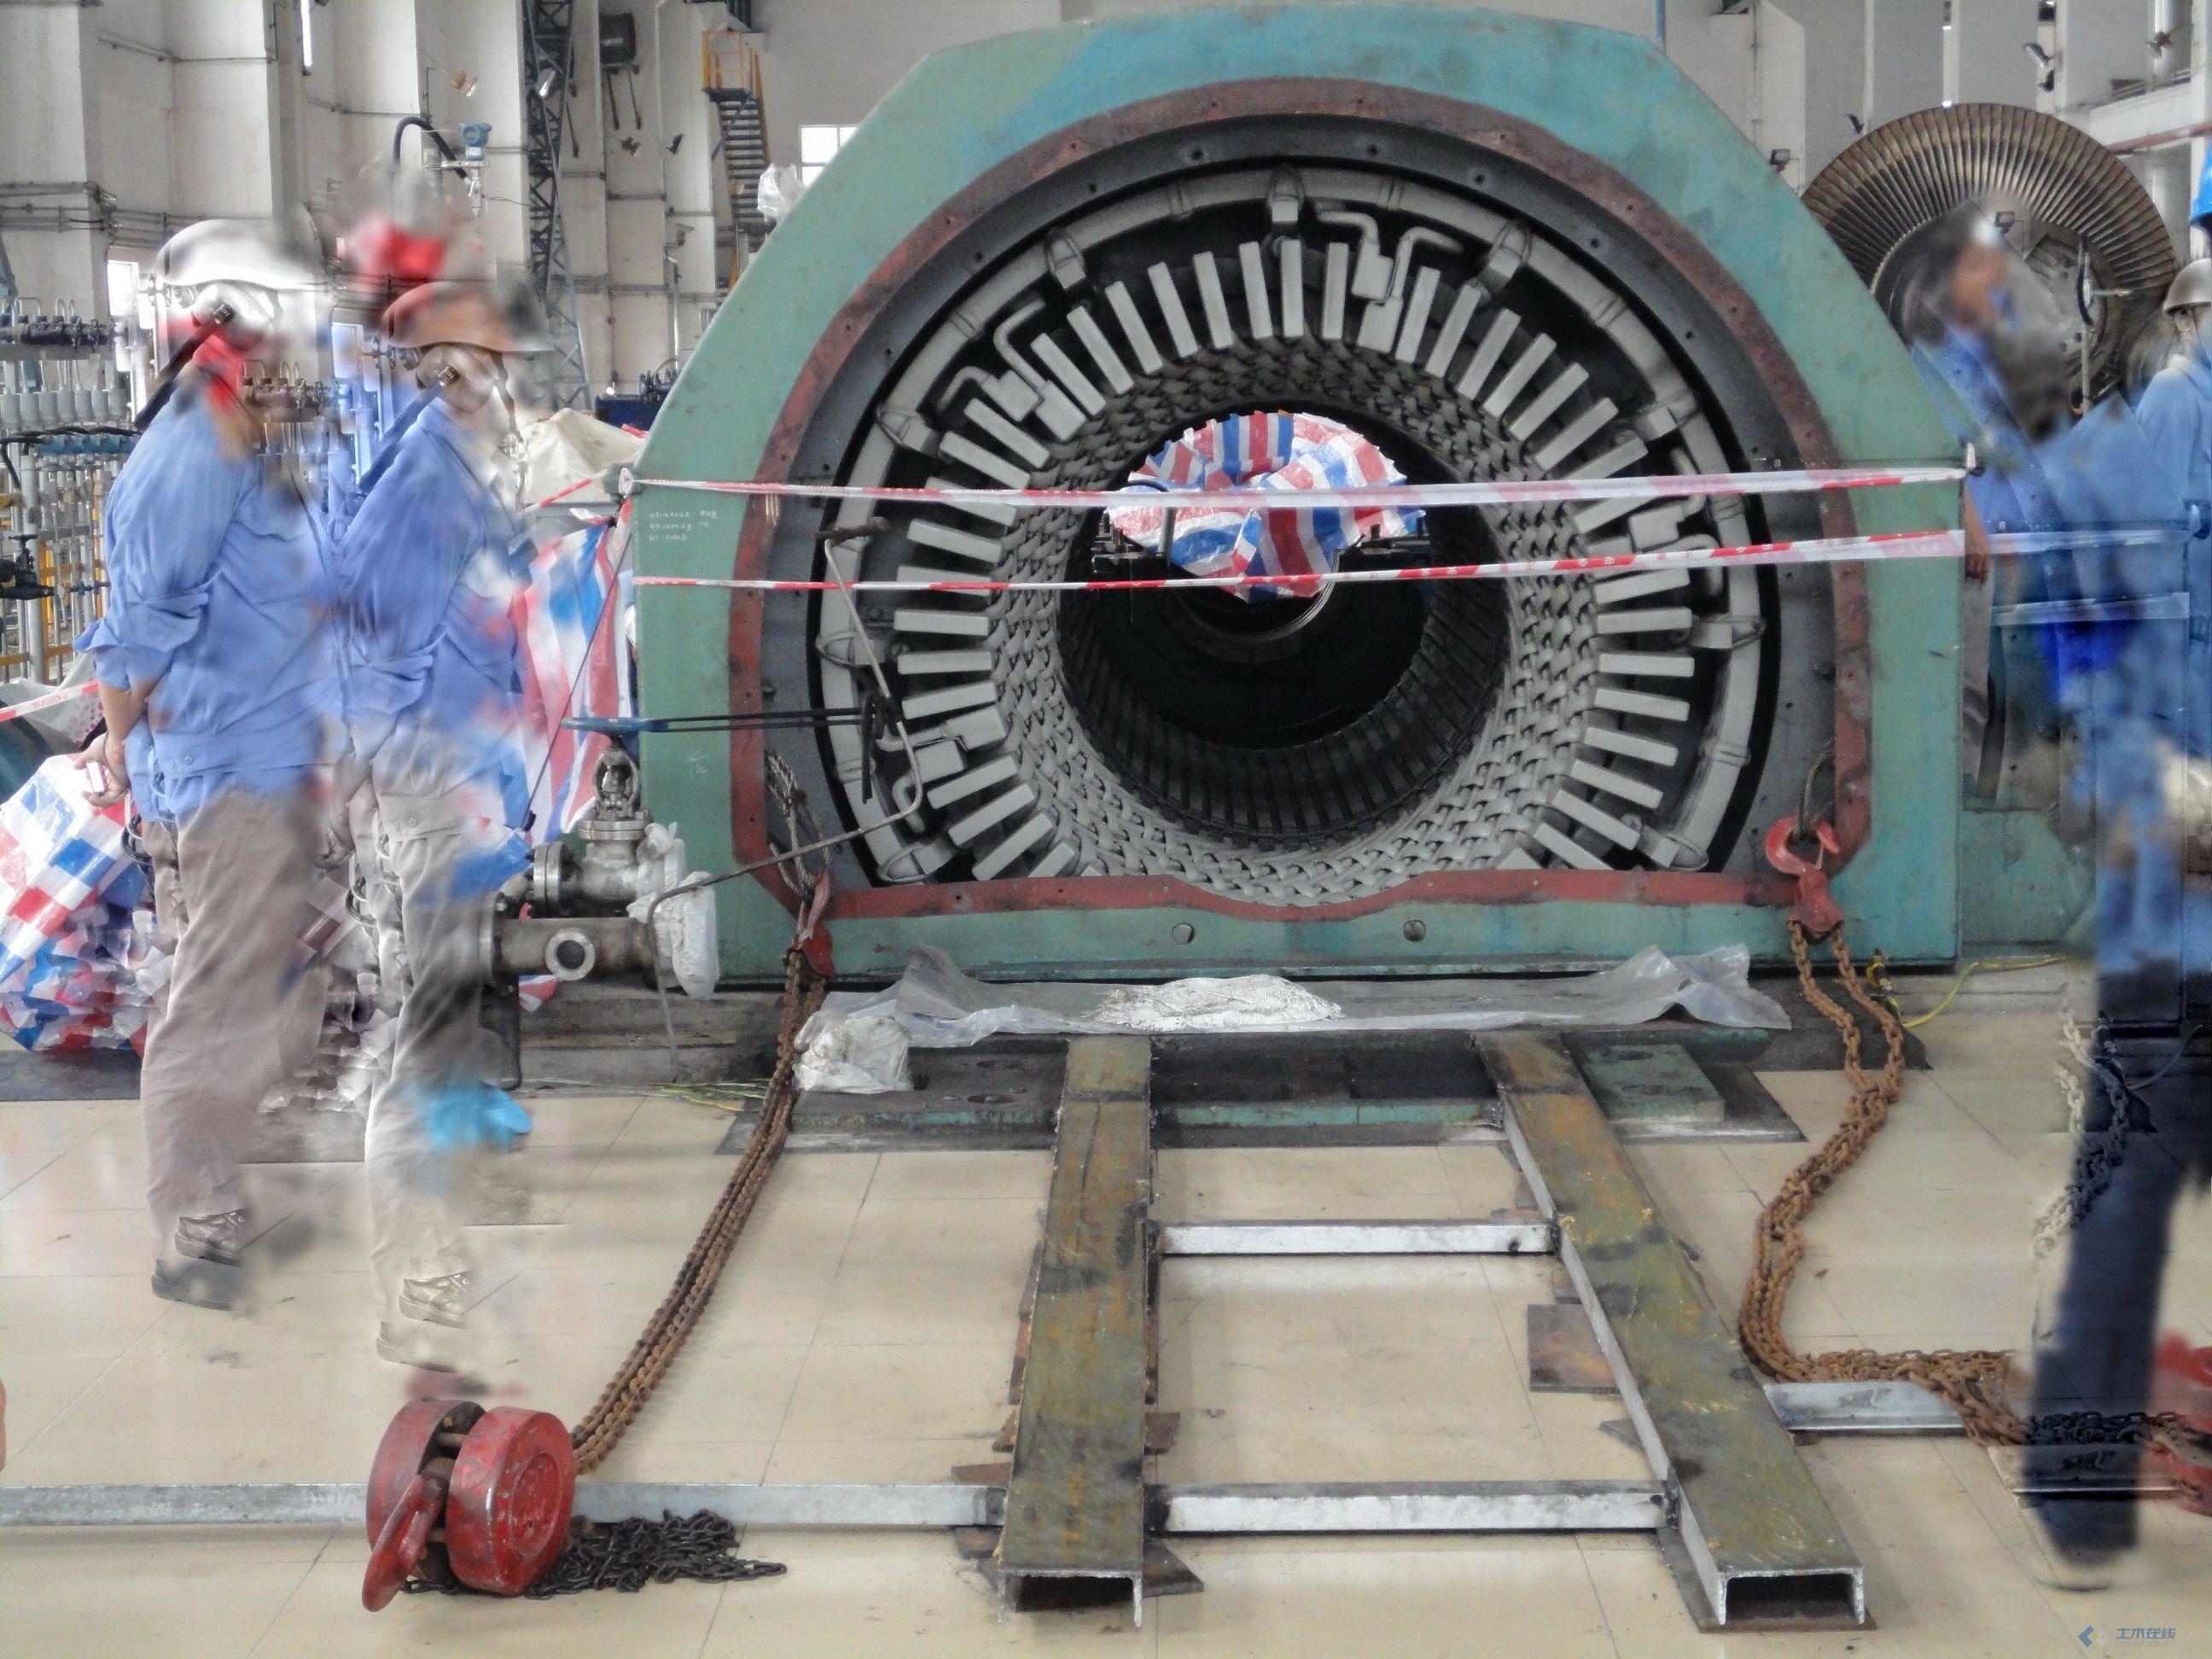 1000mw级汽轮发电机转子端部线圈温升的分析